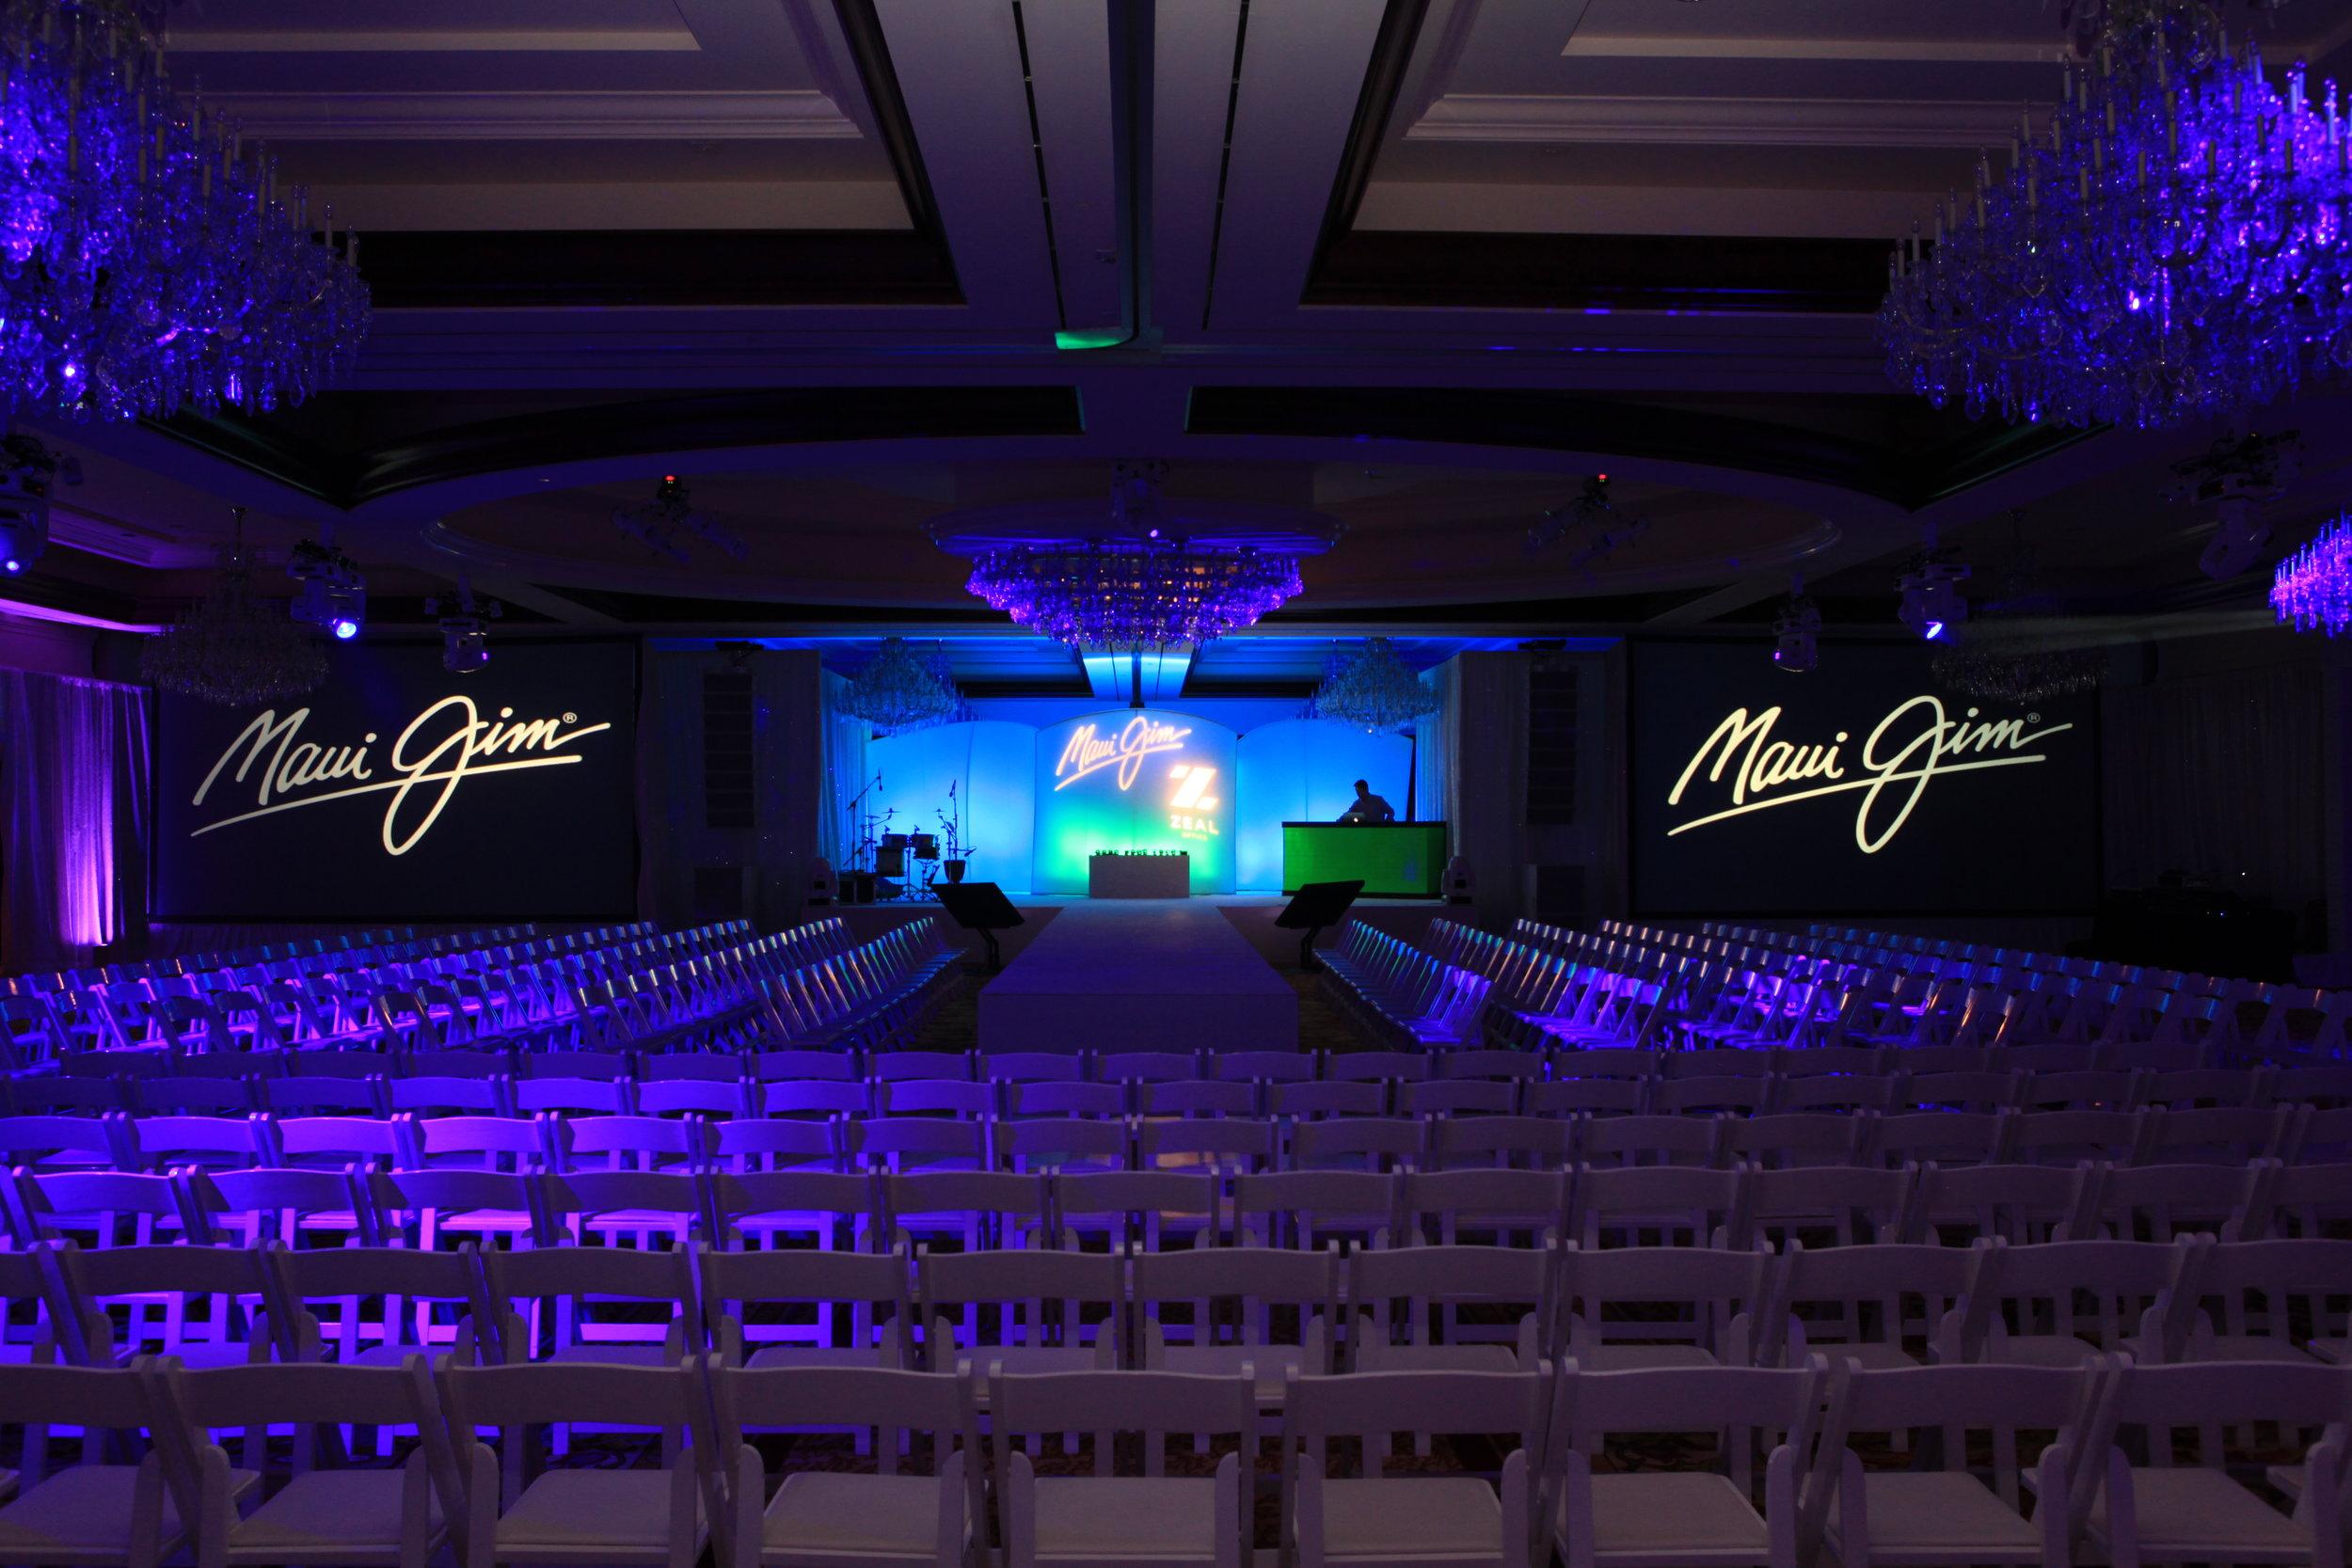 Stage Lighting, Custom Corporate Gobos, Custom Projection